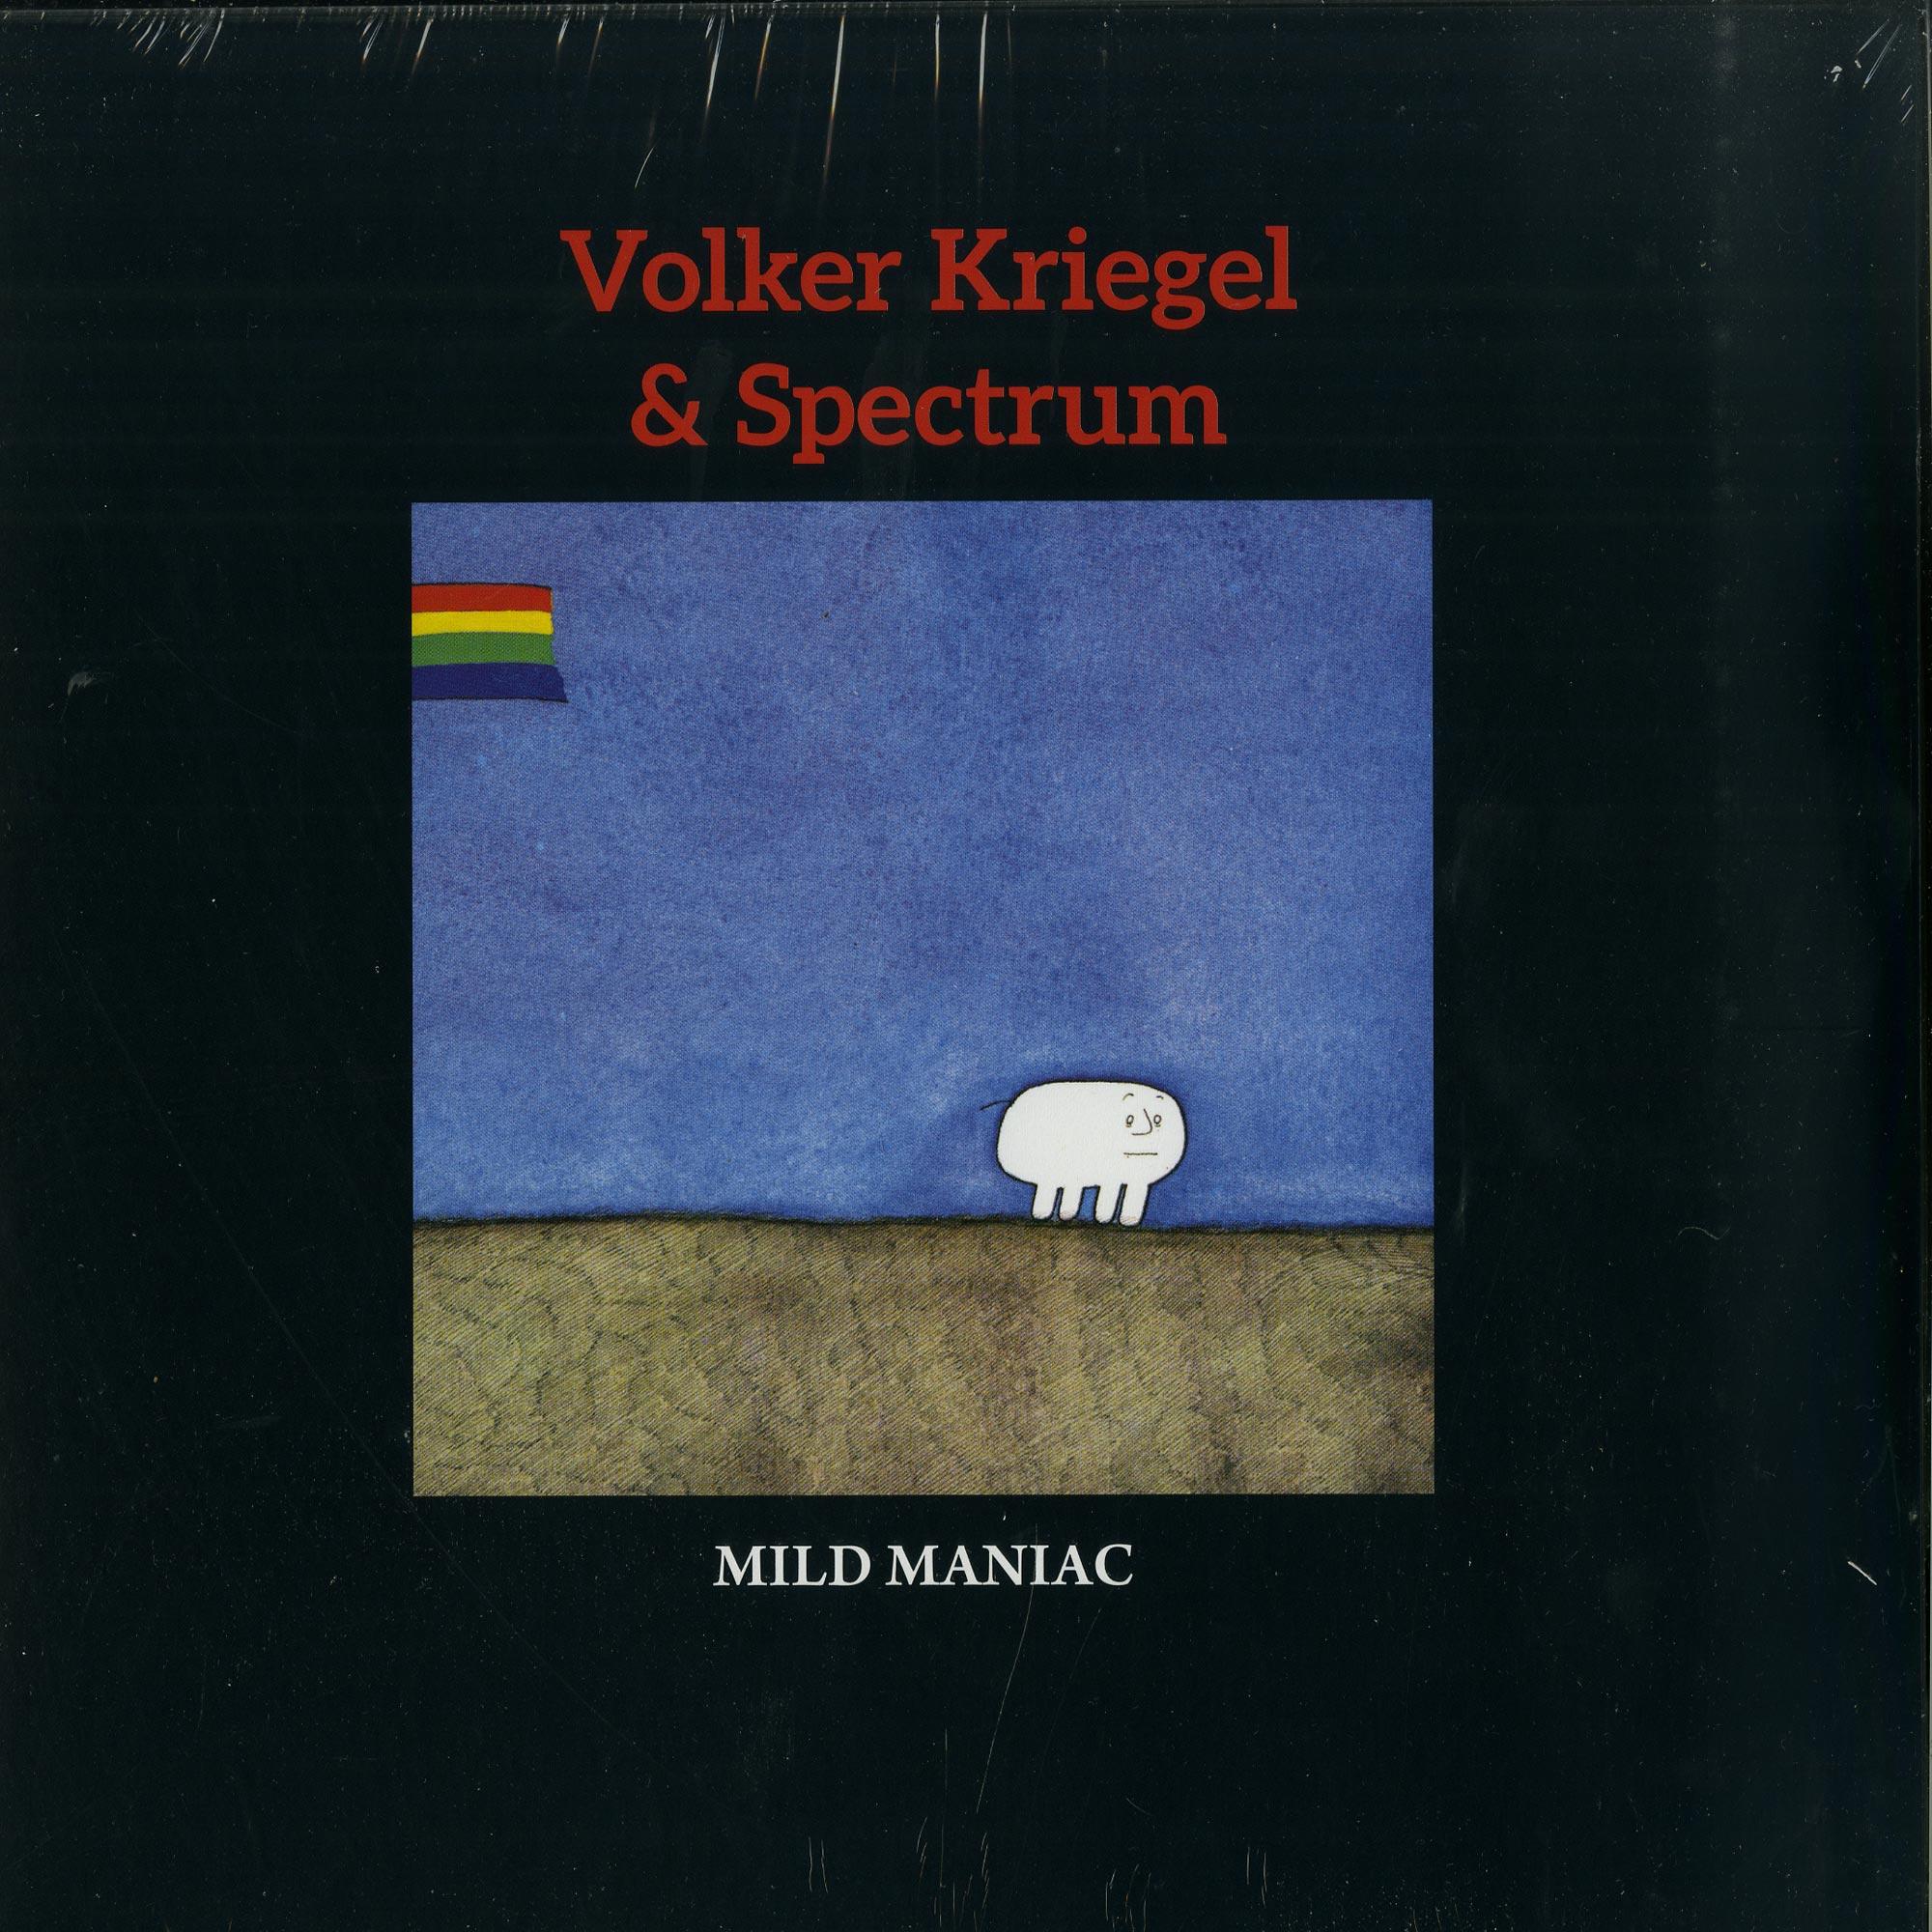 Volker Kriegel & Spectrum - MILD MANIAC